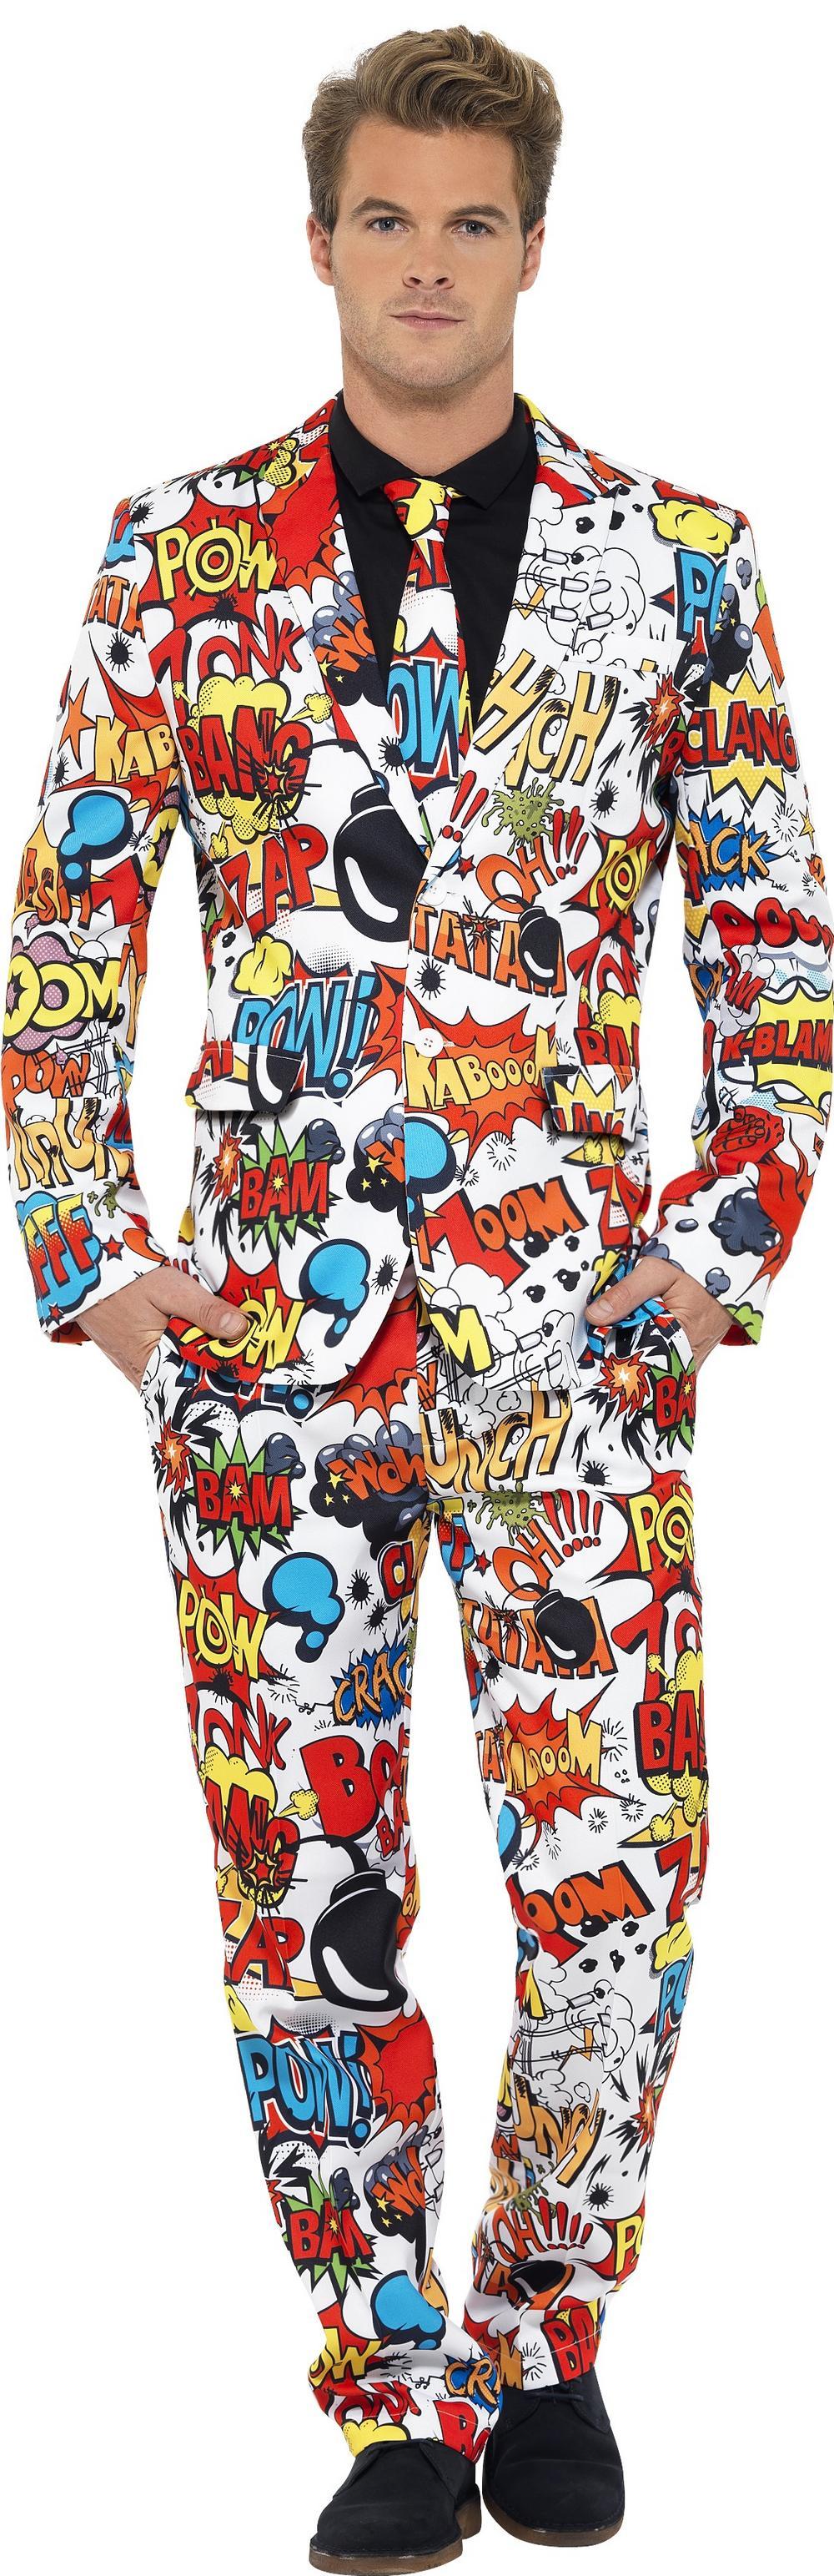 Comic Strip Suit Costume